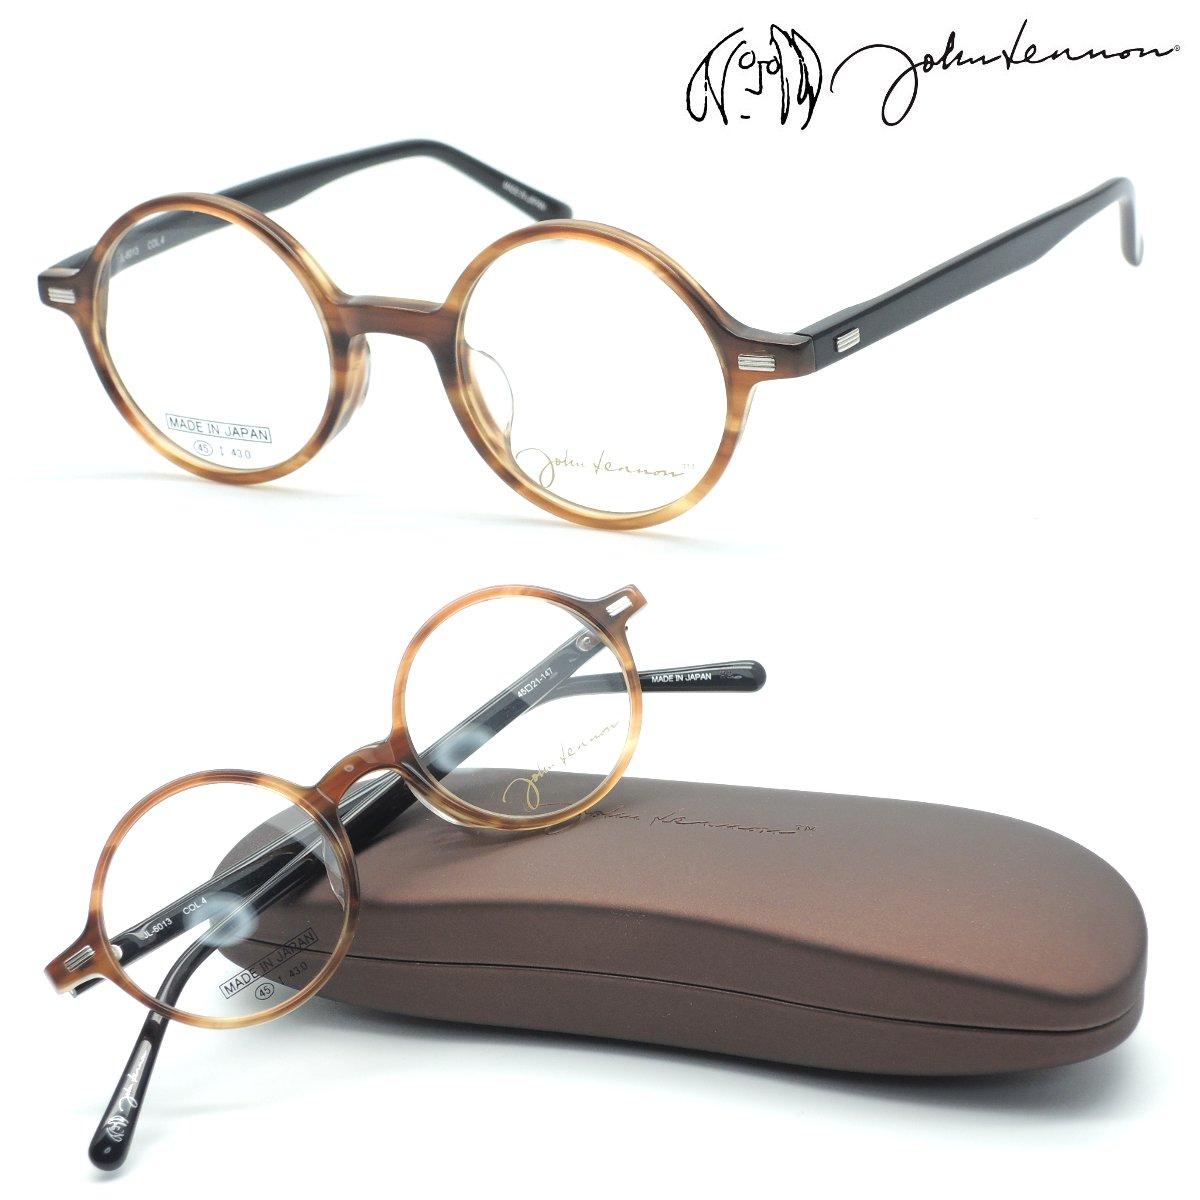 【john lennon】ジョンレノン JL-6013 col.4 メガネ 度付又は度無レンズセット 日本製 【正規品】【店内全品送料無料】【丸メガネ】